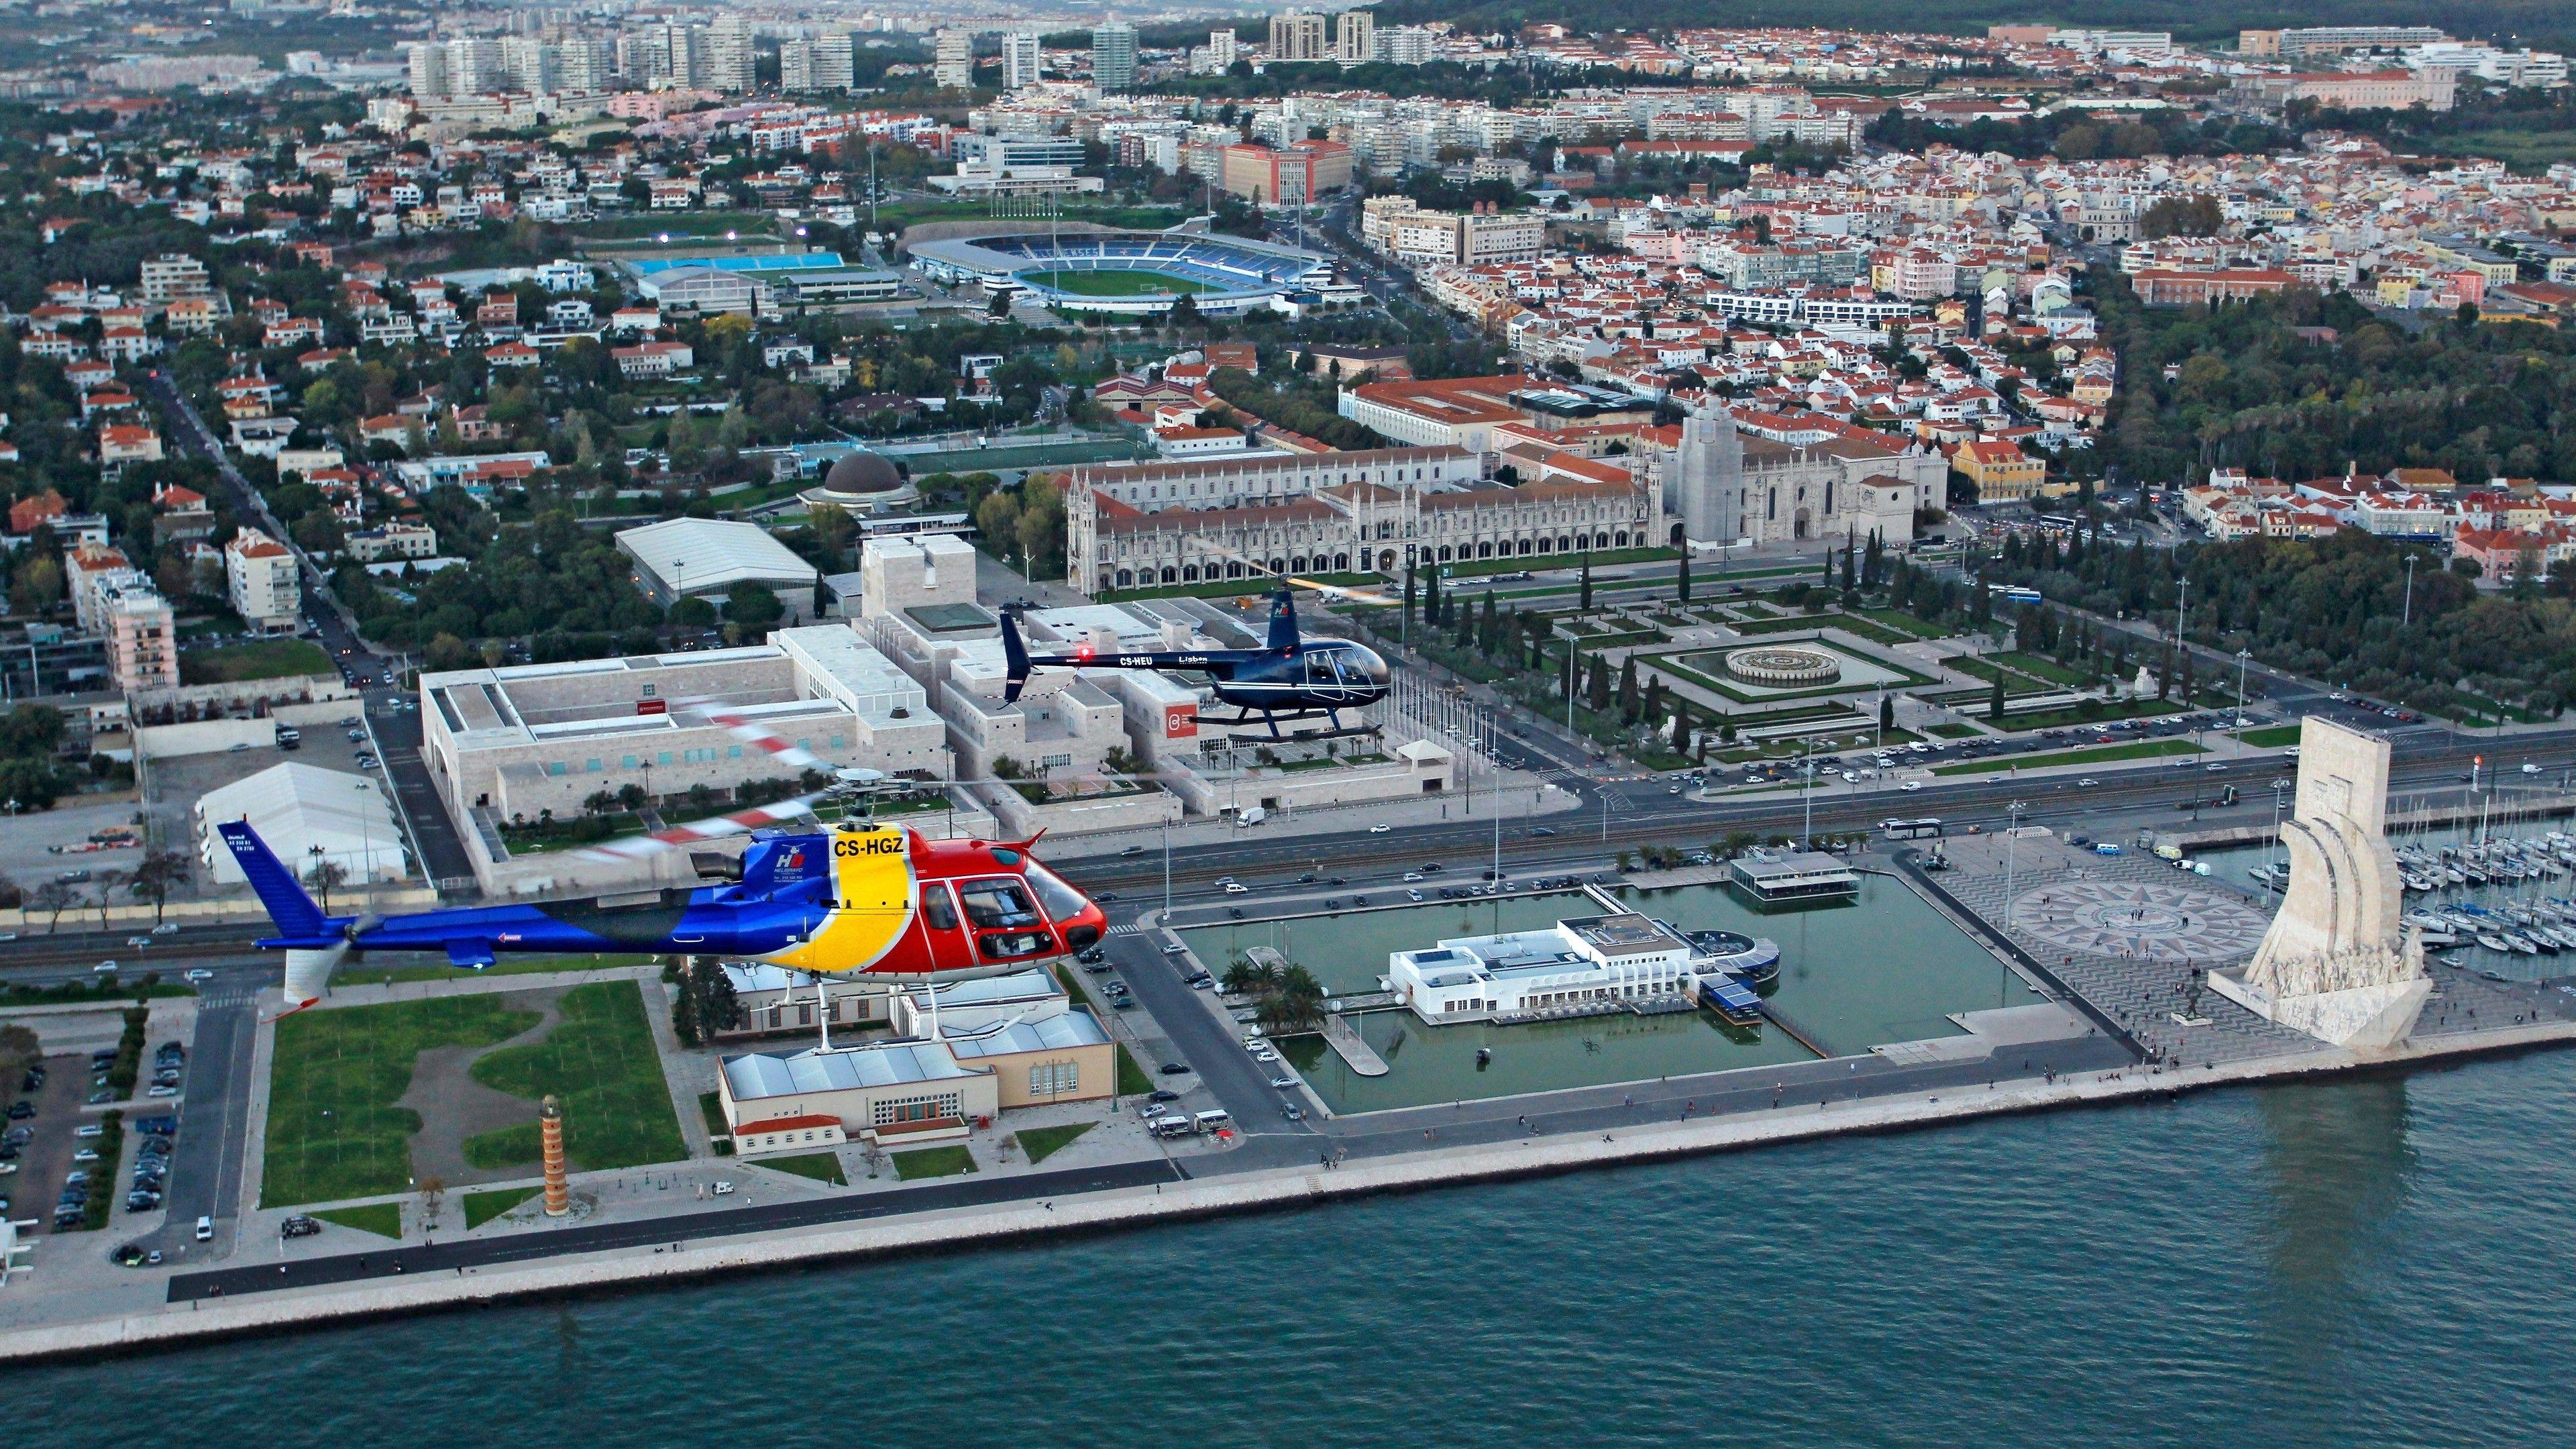 LisbonHelicopters_105_AndreGarcez_padrao.jpg